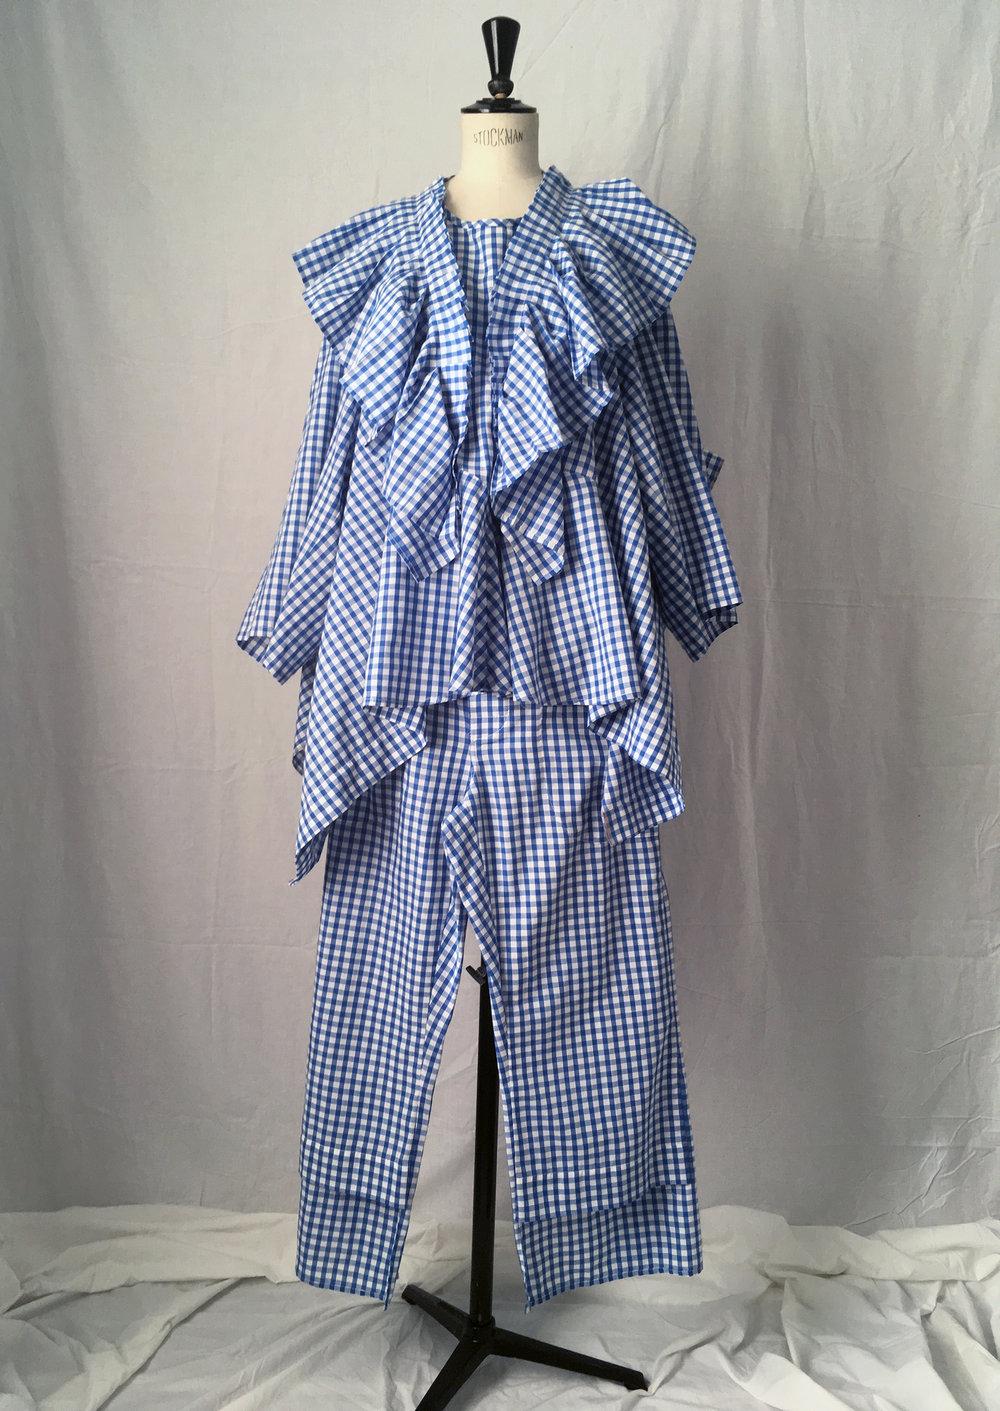 DRESS LTD Dorothy's Pyjamas Set 2: FLAT PACK HALF DRESS & FLAT PACK PYJAMA Trousers - #dressltd